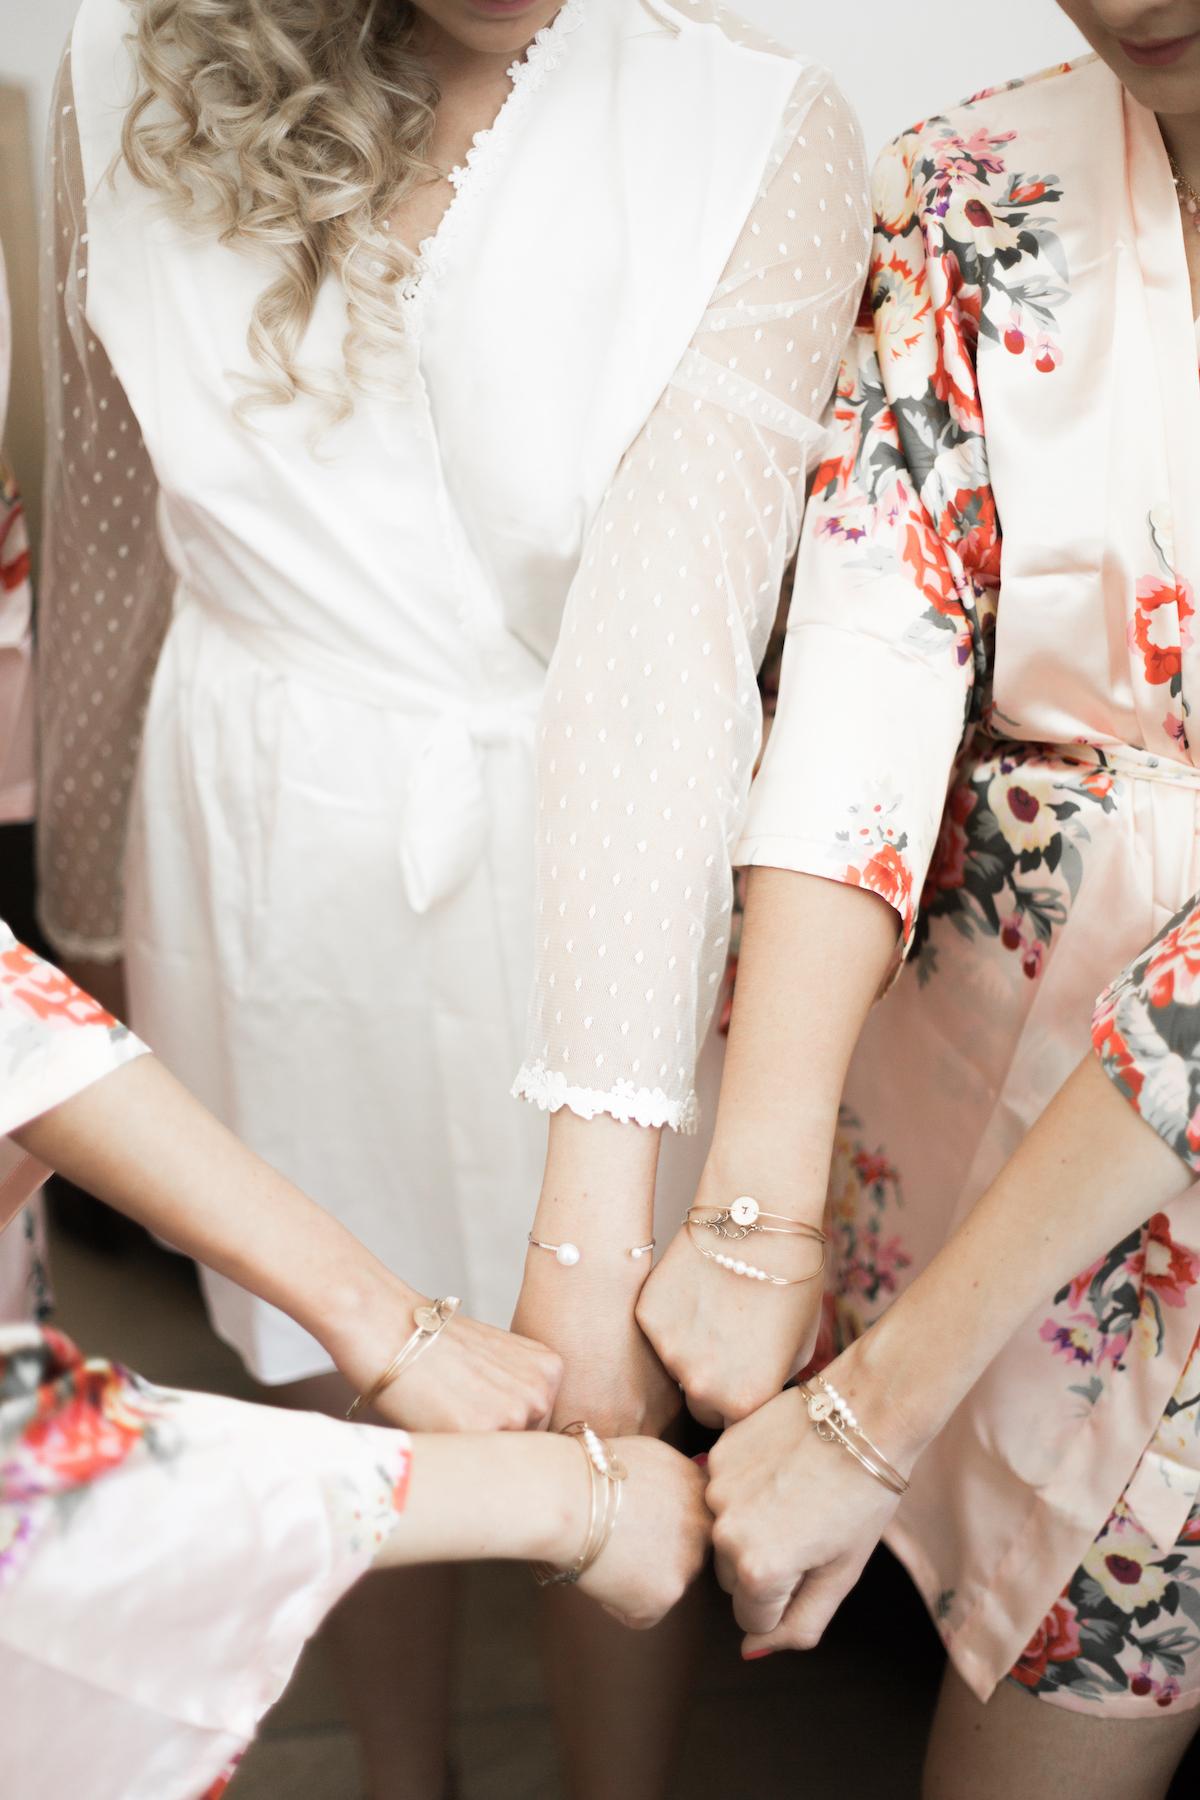 annecy-wedding-photos-66.jpg